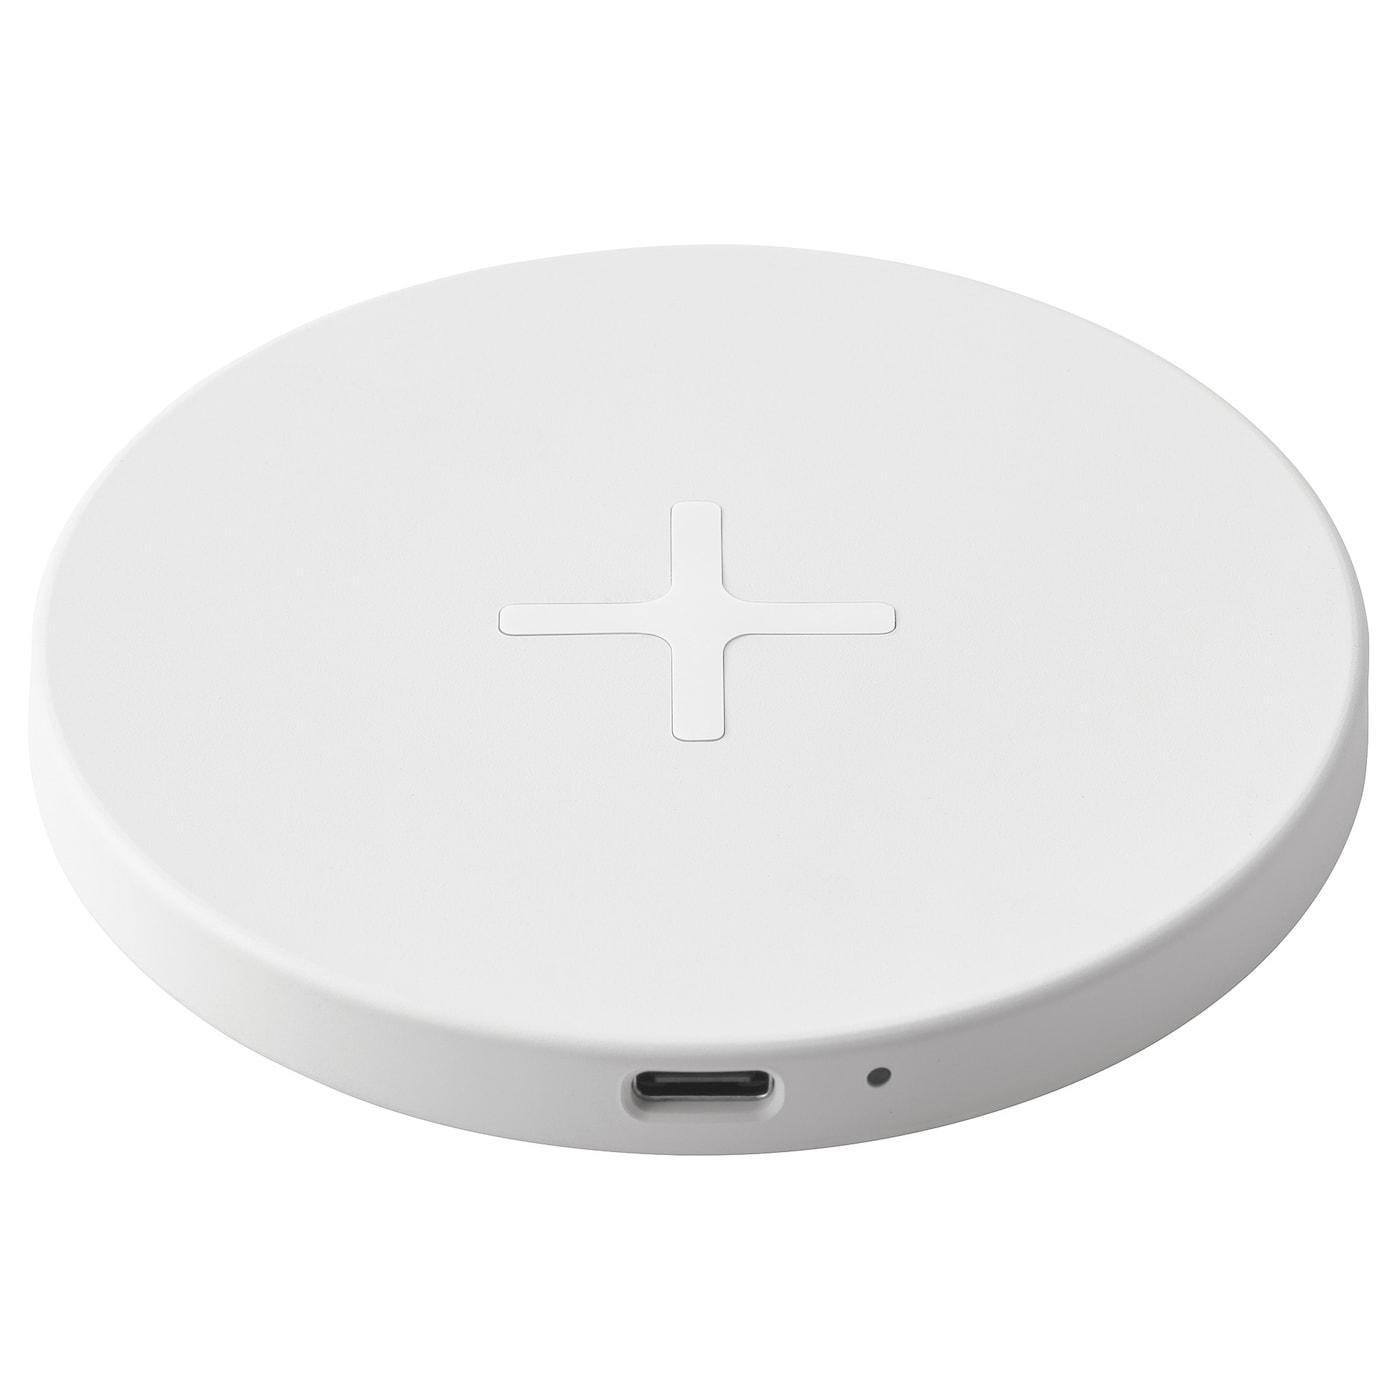 Livboj Wireless Charger White Ikea